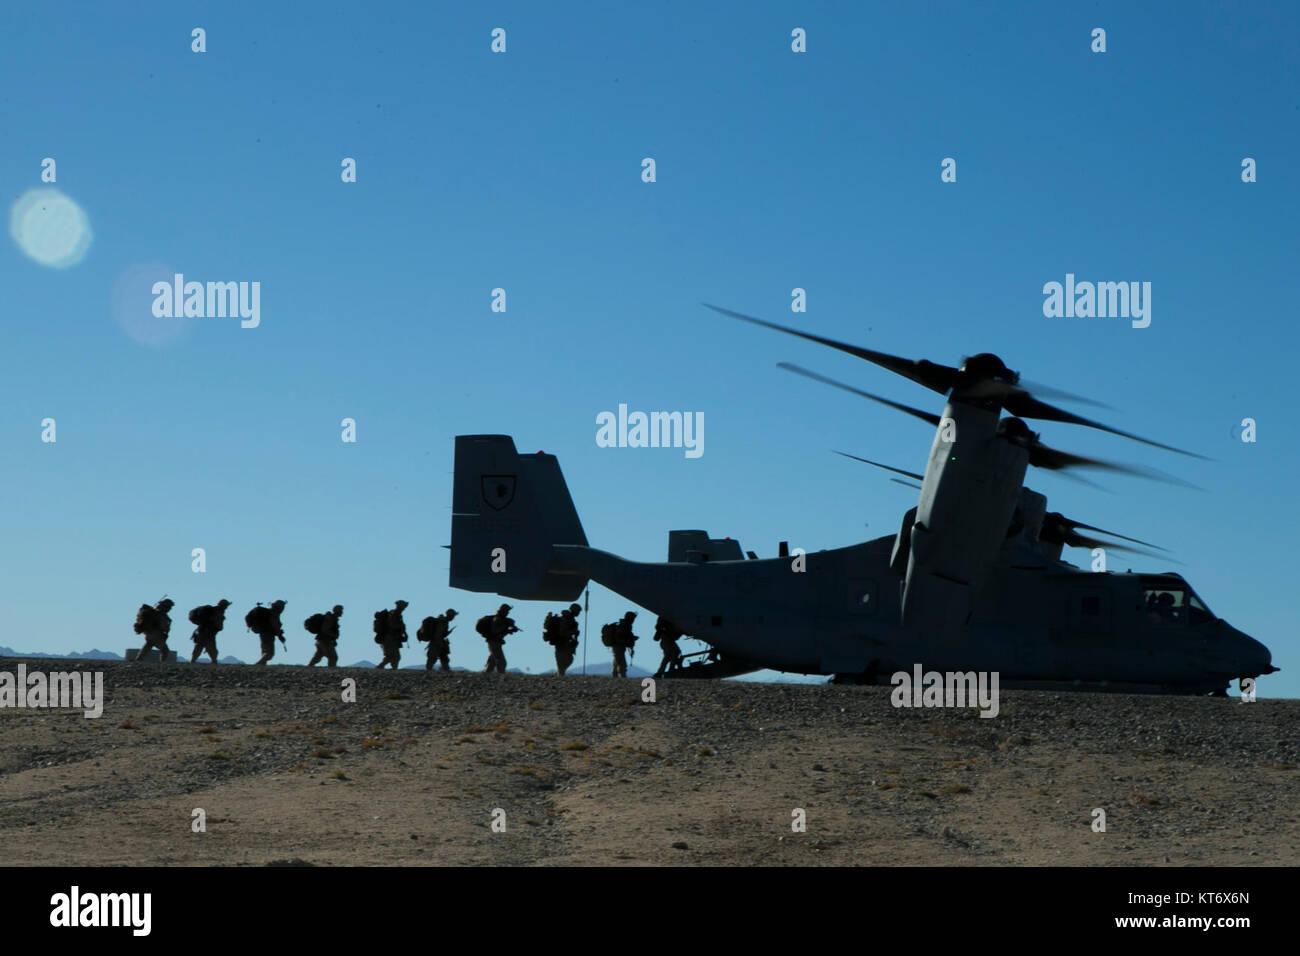 U.S. Marines with 2nd Battalion, 5th Marine Regiment, 1st Marine Division (MARDIV), board an MV-22 Osprey aircraft - Stock Image